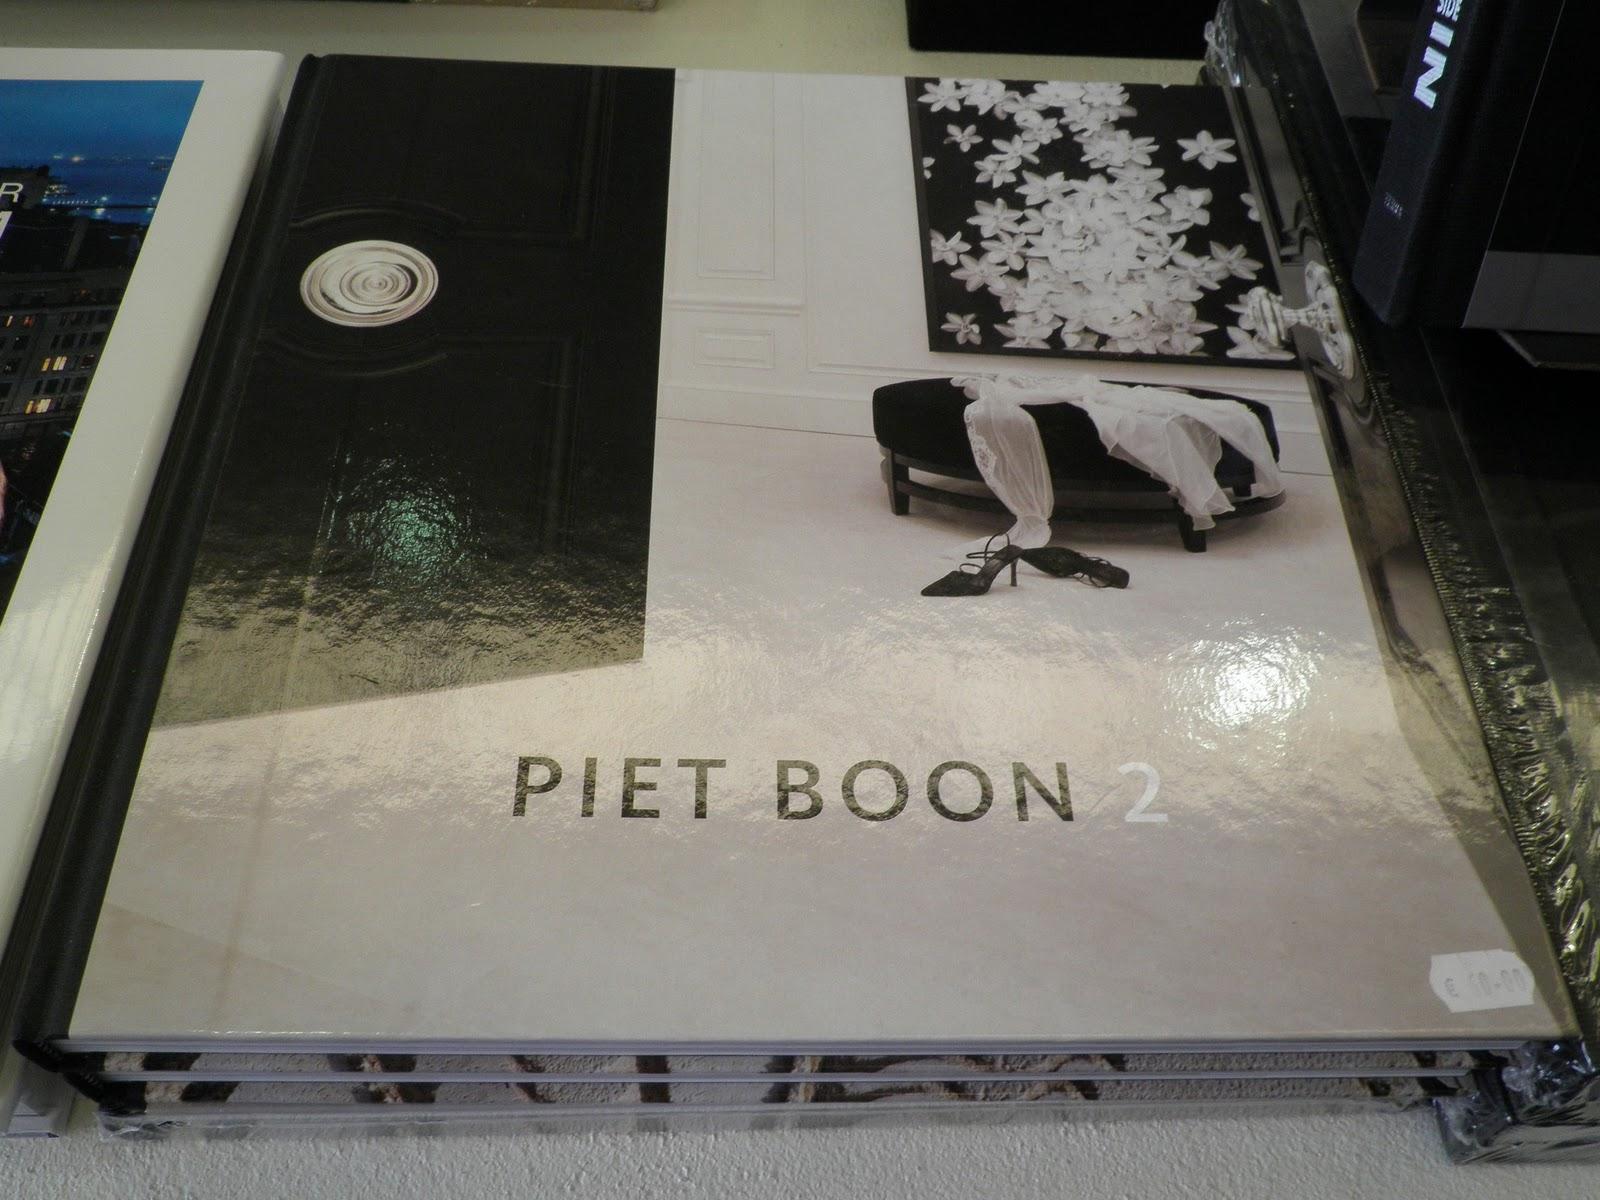 ByElisabethNL: INTERIEURBOEK: PIET BOON 2